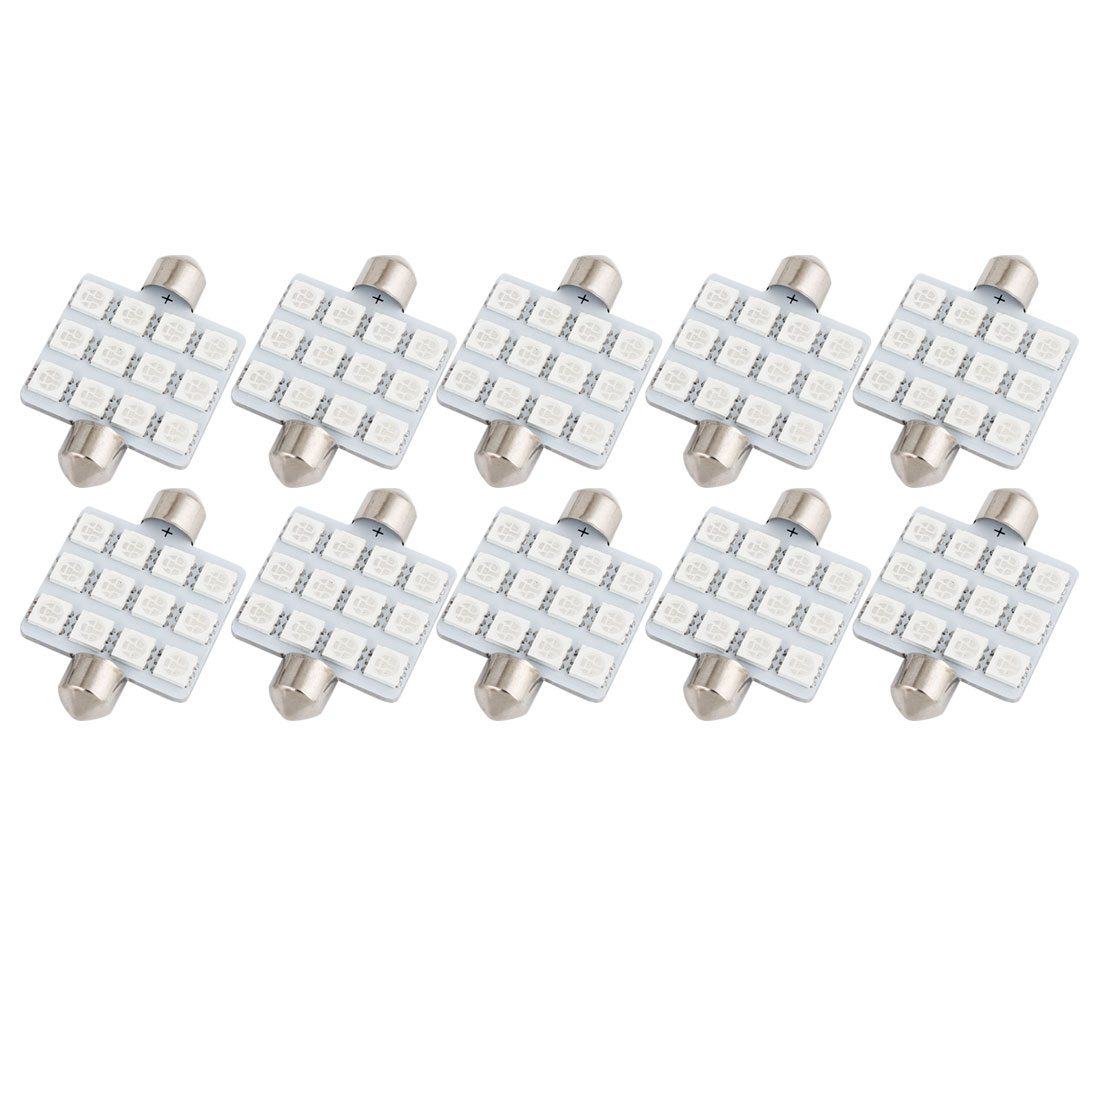 10pcs 41mm 5050 SMD 12-LED Festoon Dome Light Green 6413 211-2 212-2 560 Internal